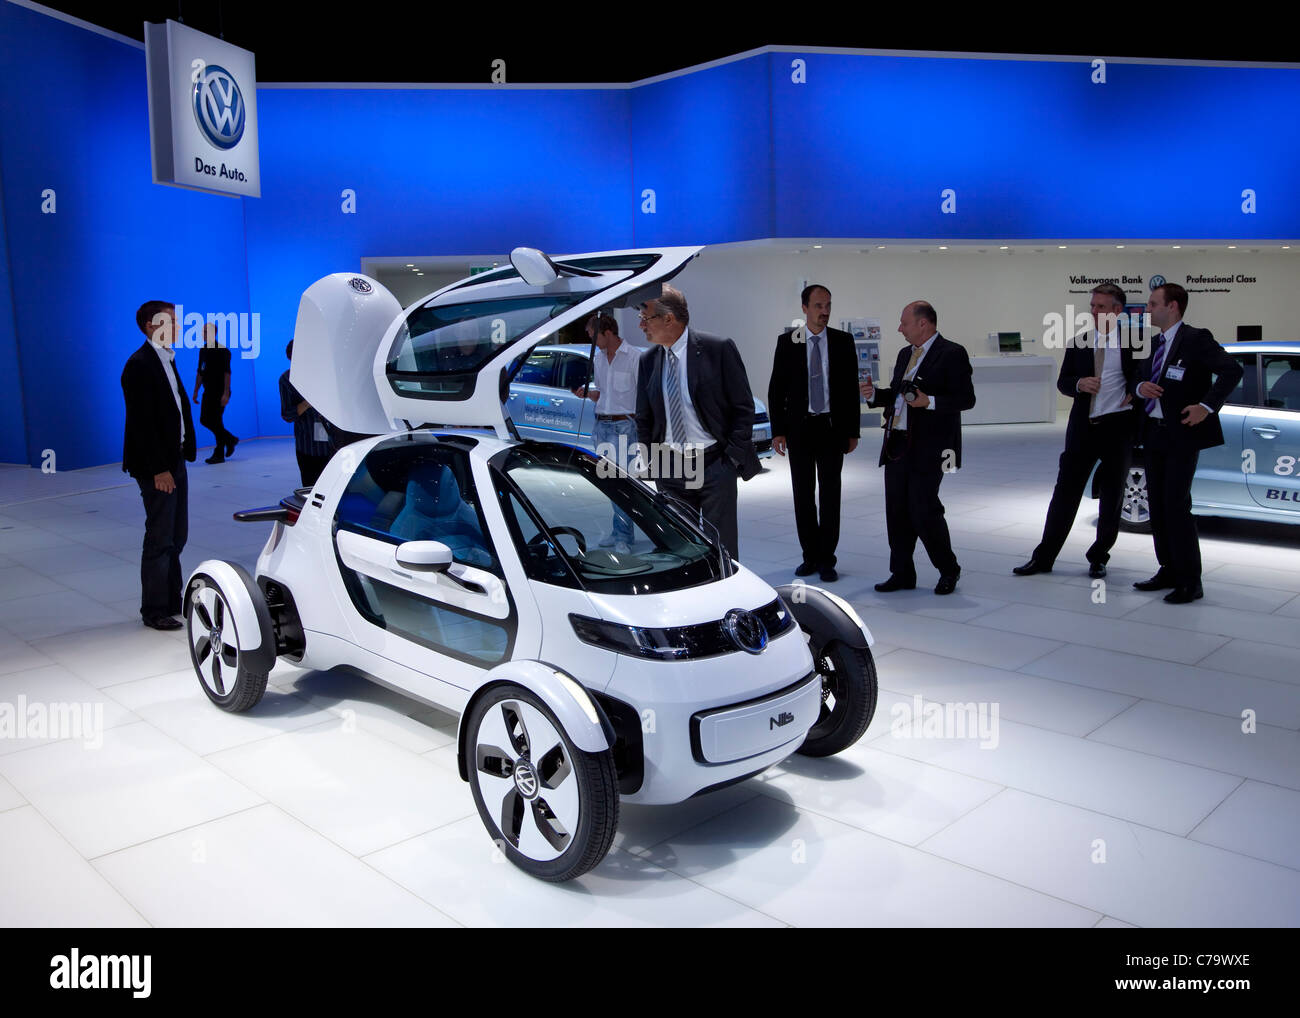 VW Volkswagen e-car Nils on the IAA 2011 International Motor Show in Frankfurt am Main, Germany Stock Photo